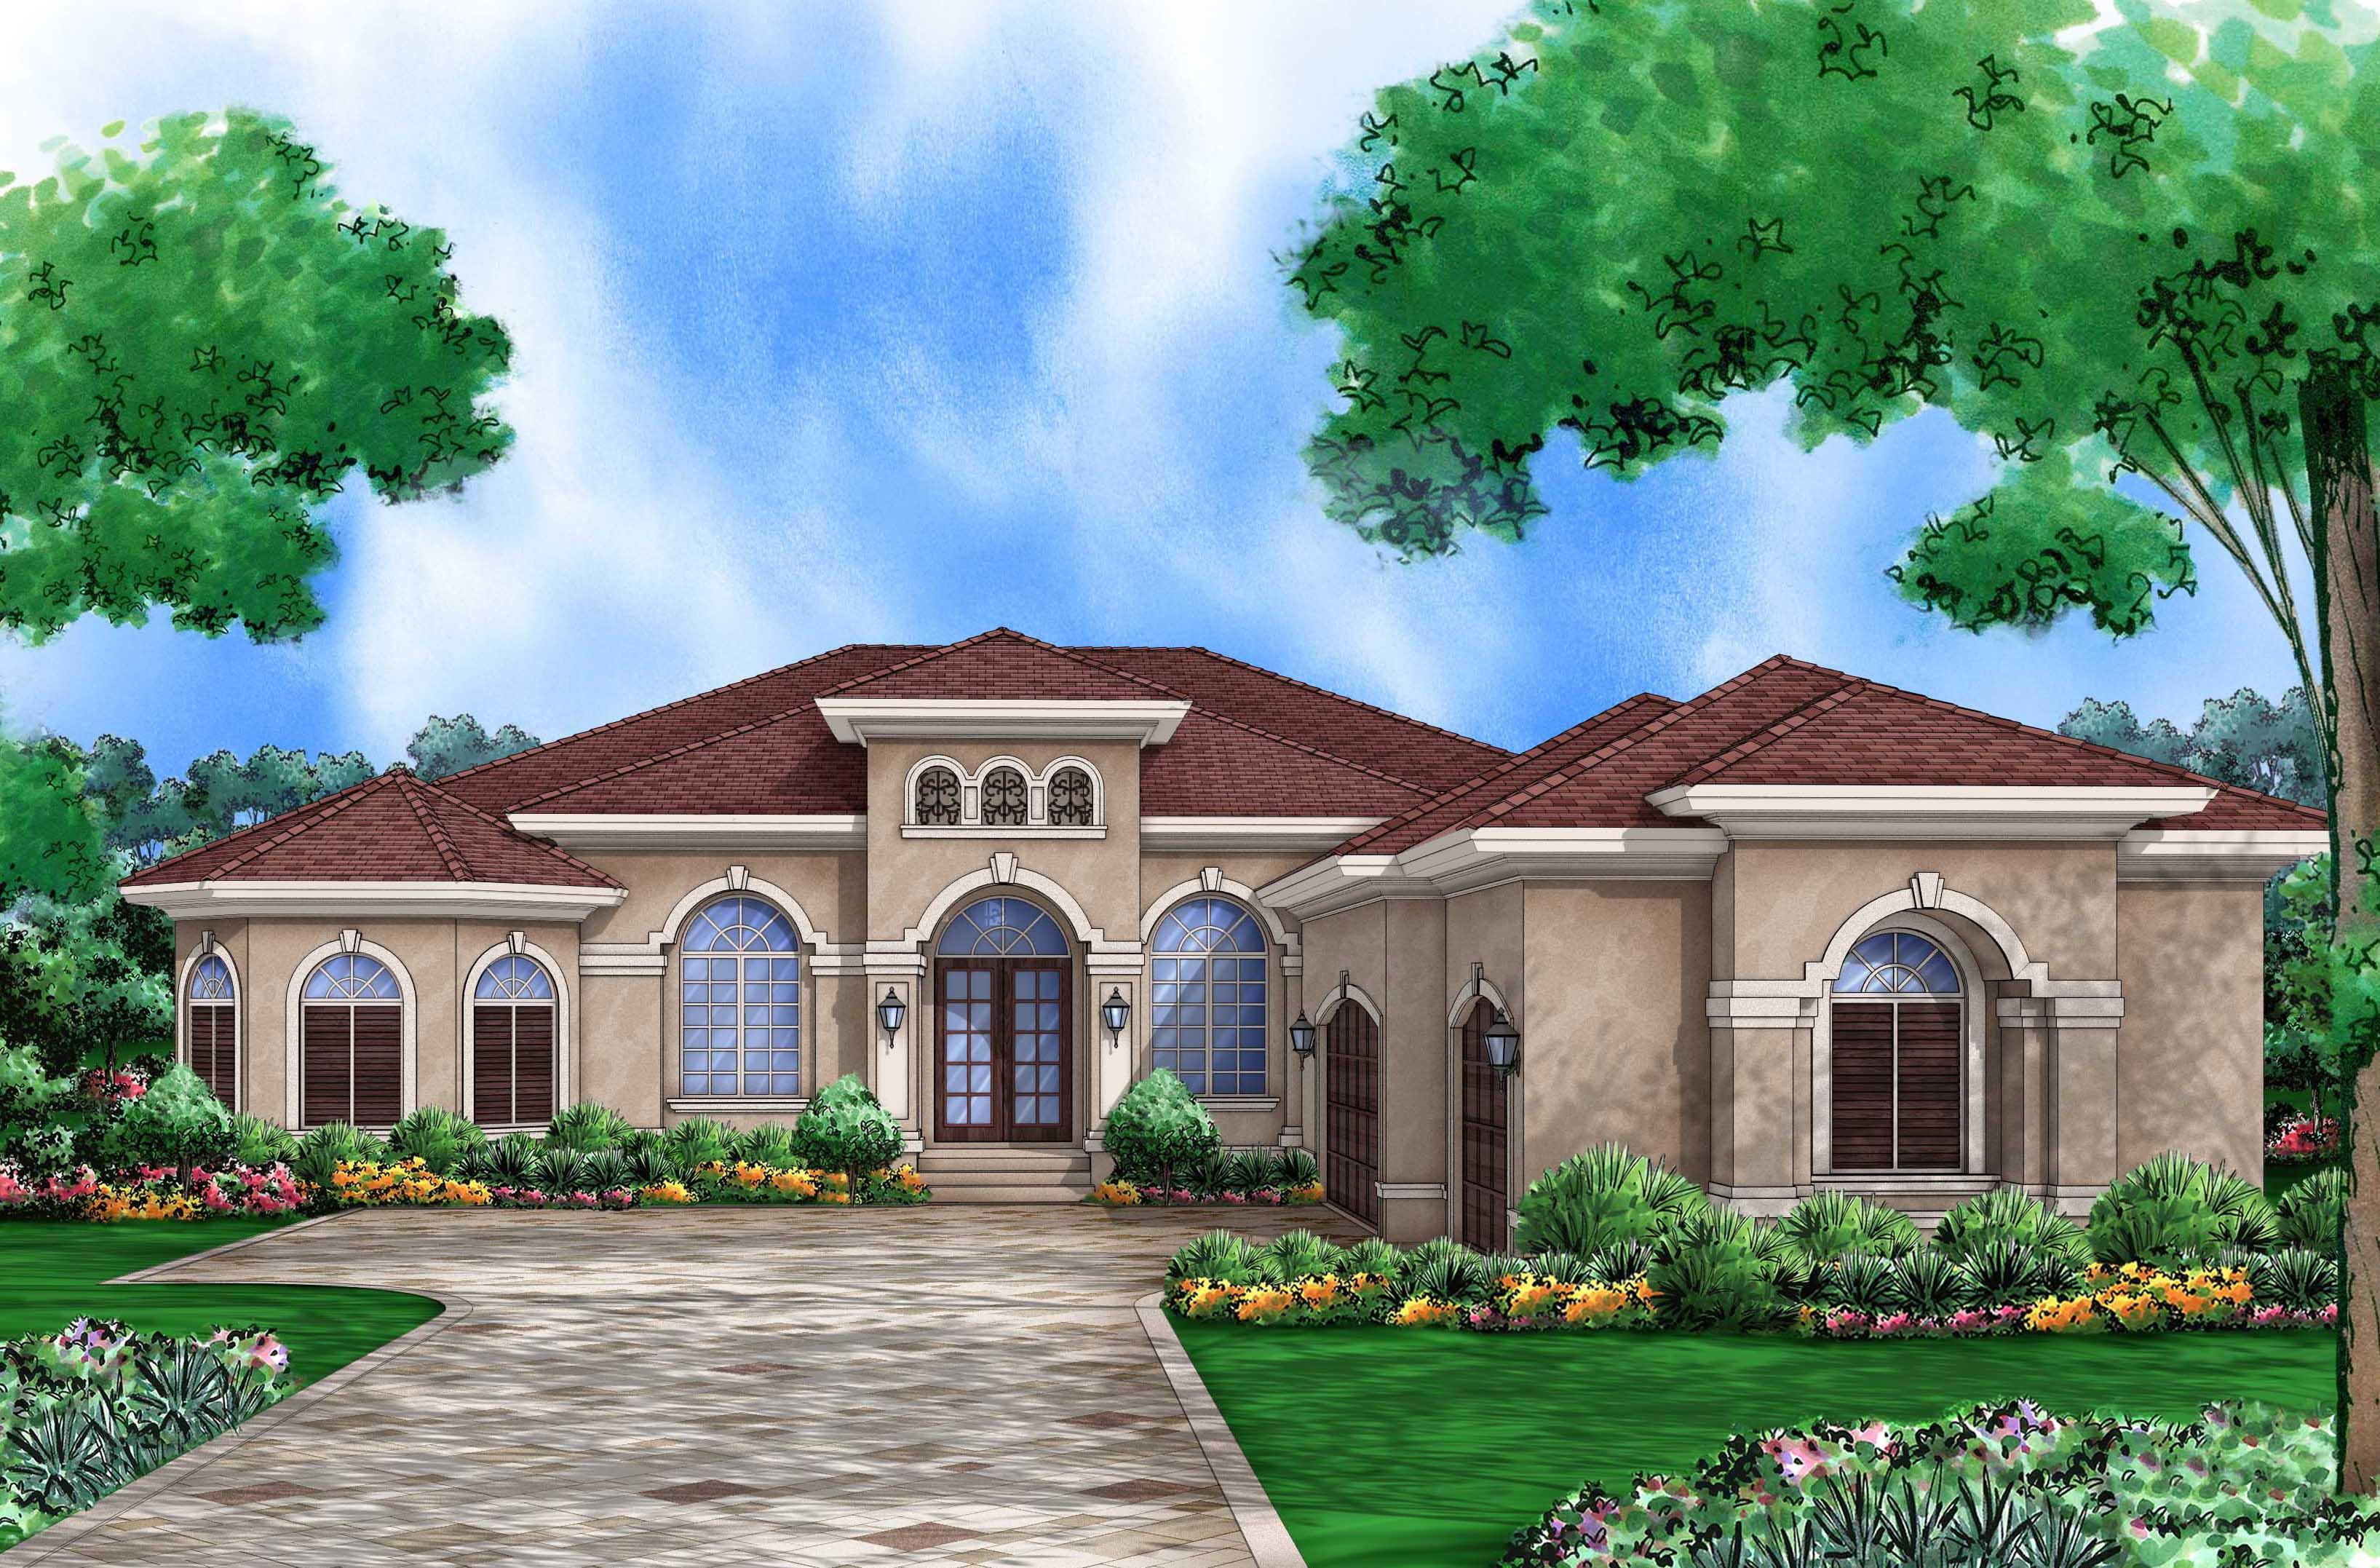 Stunning Mediterranean Home Plan 65605bs Architectural Designs House Plans